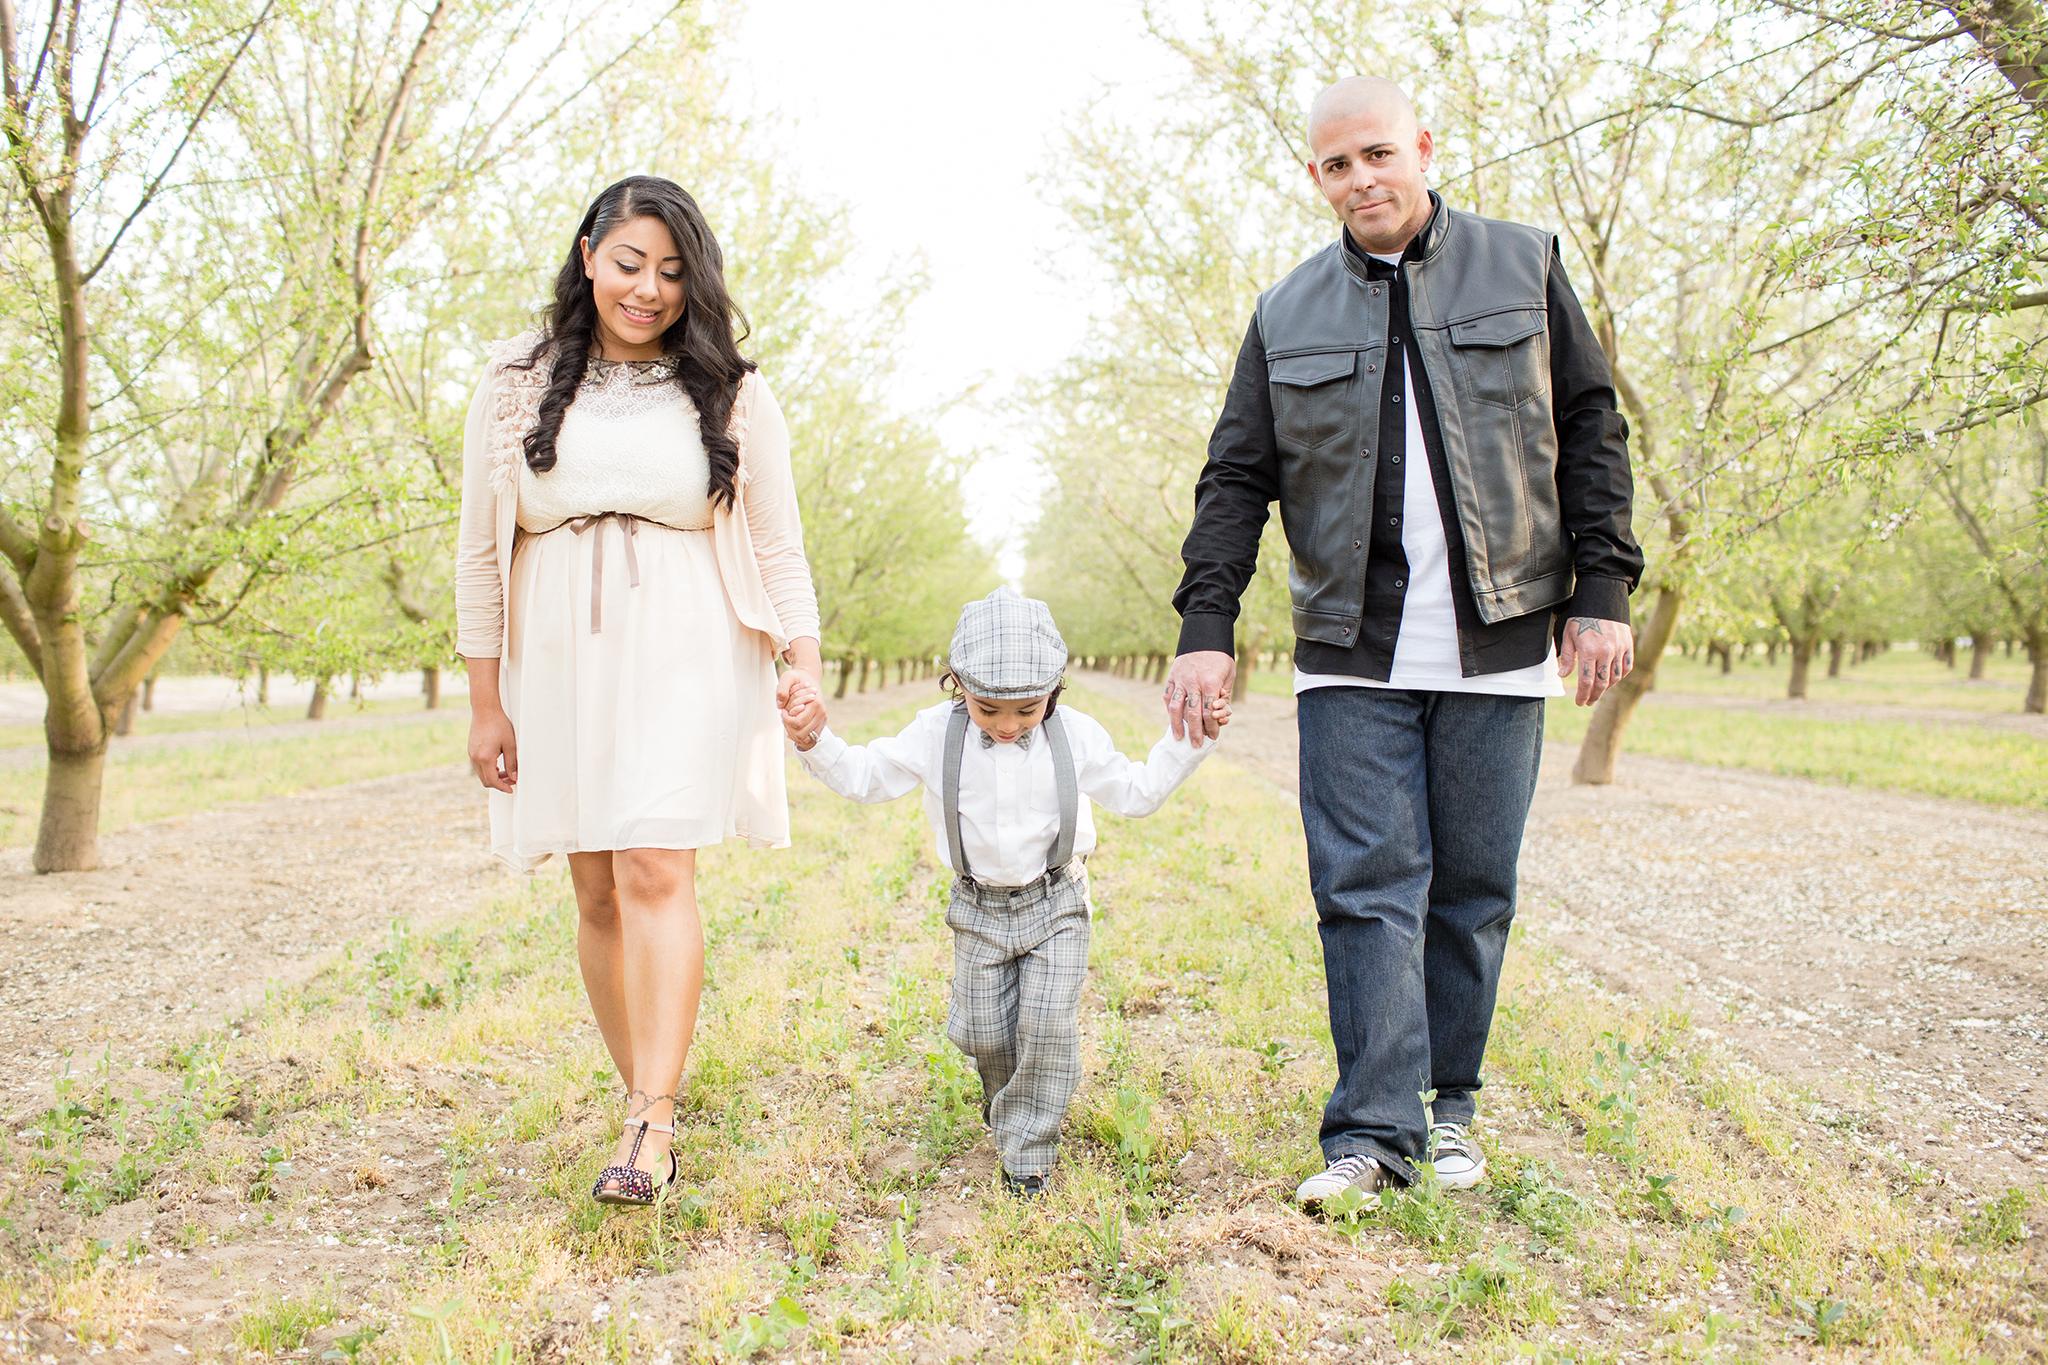 Malone-Family-20130317-018.jpg